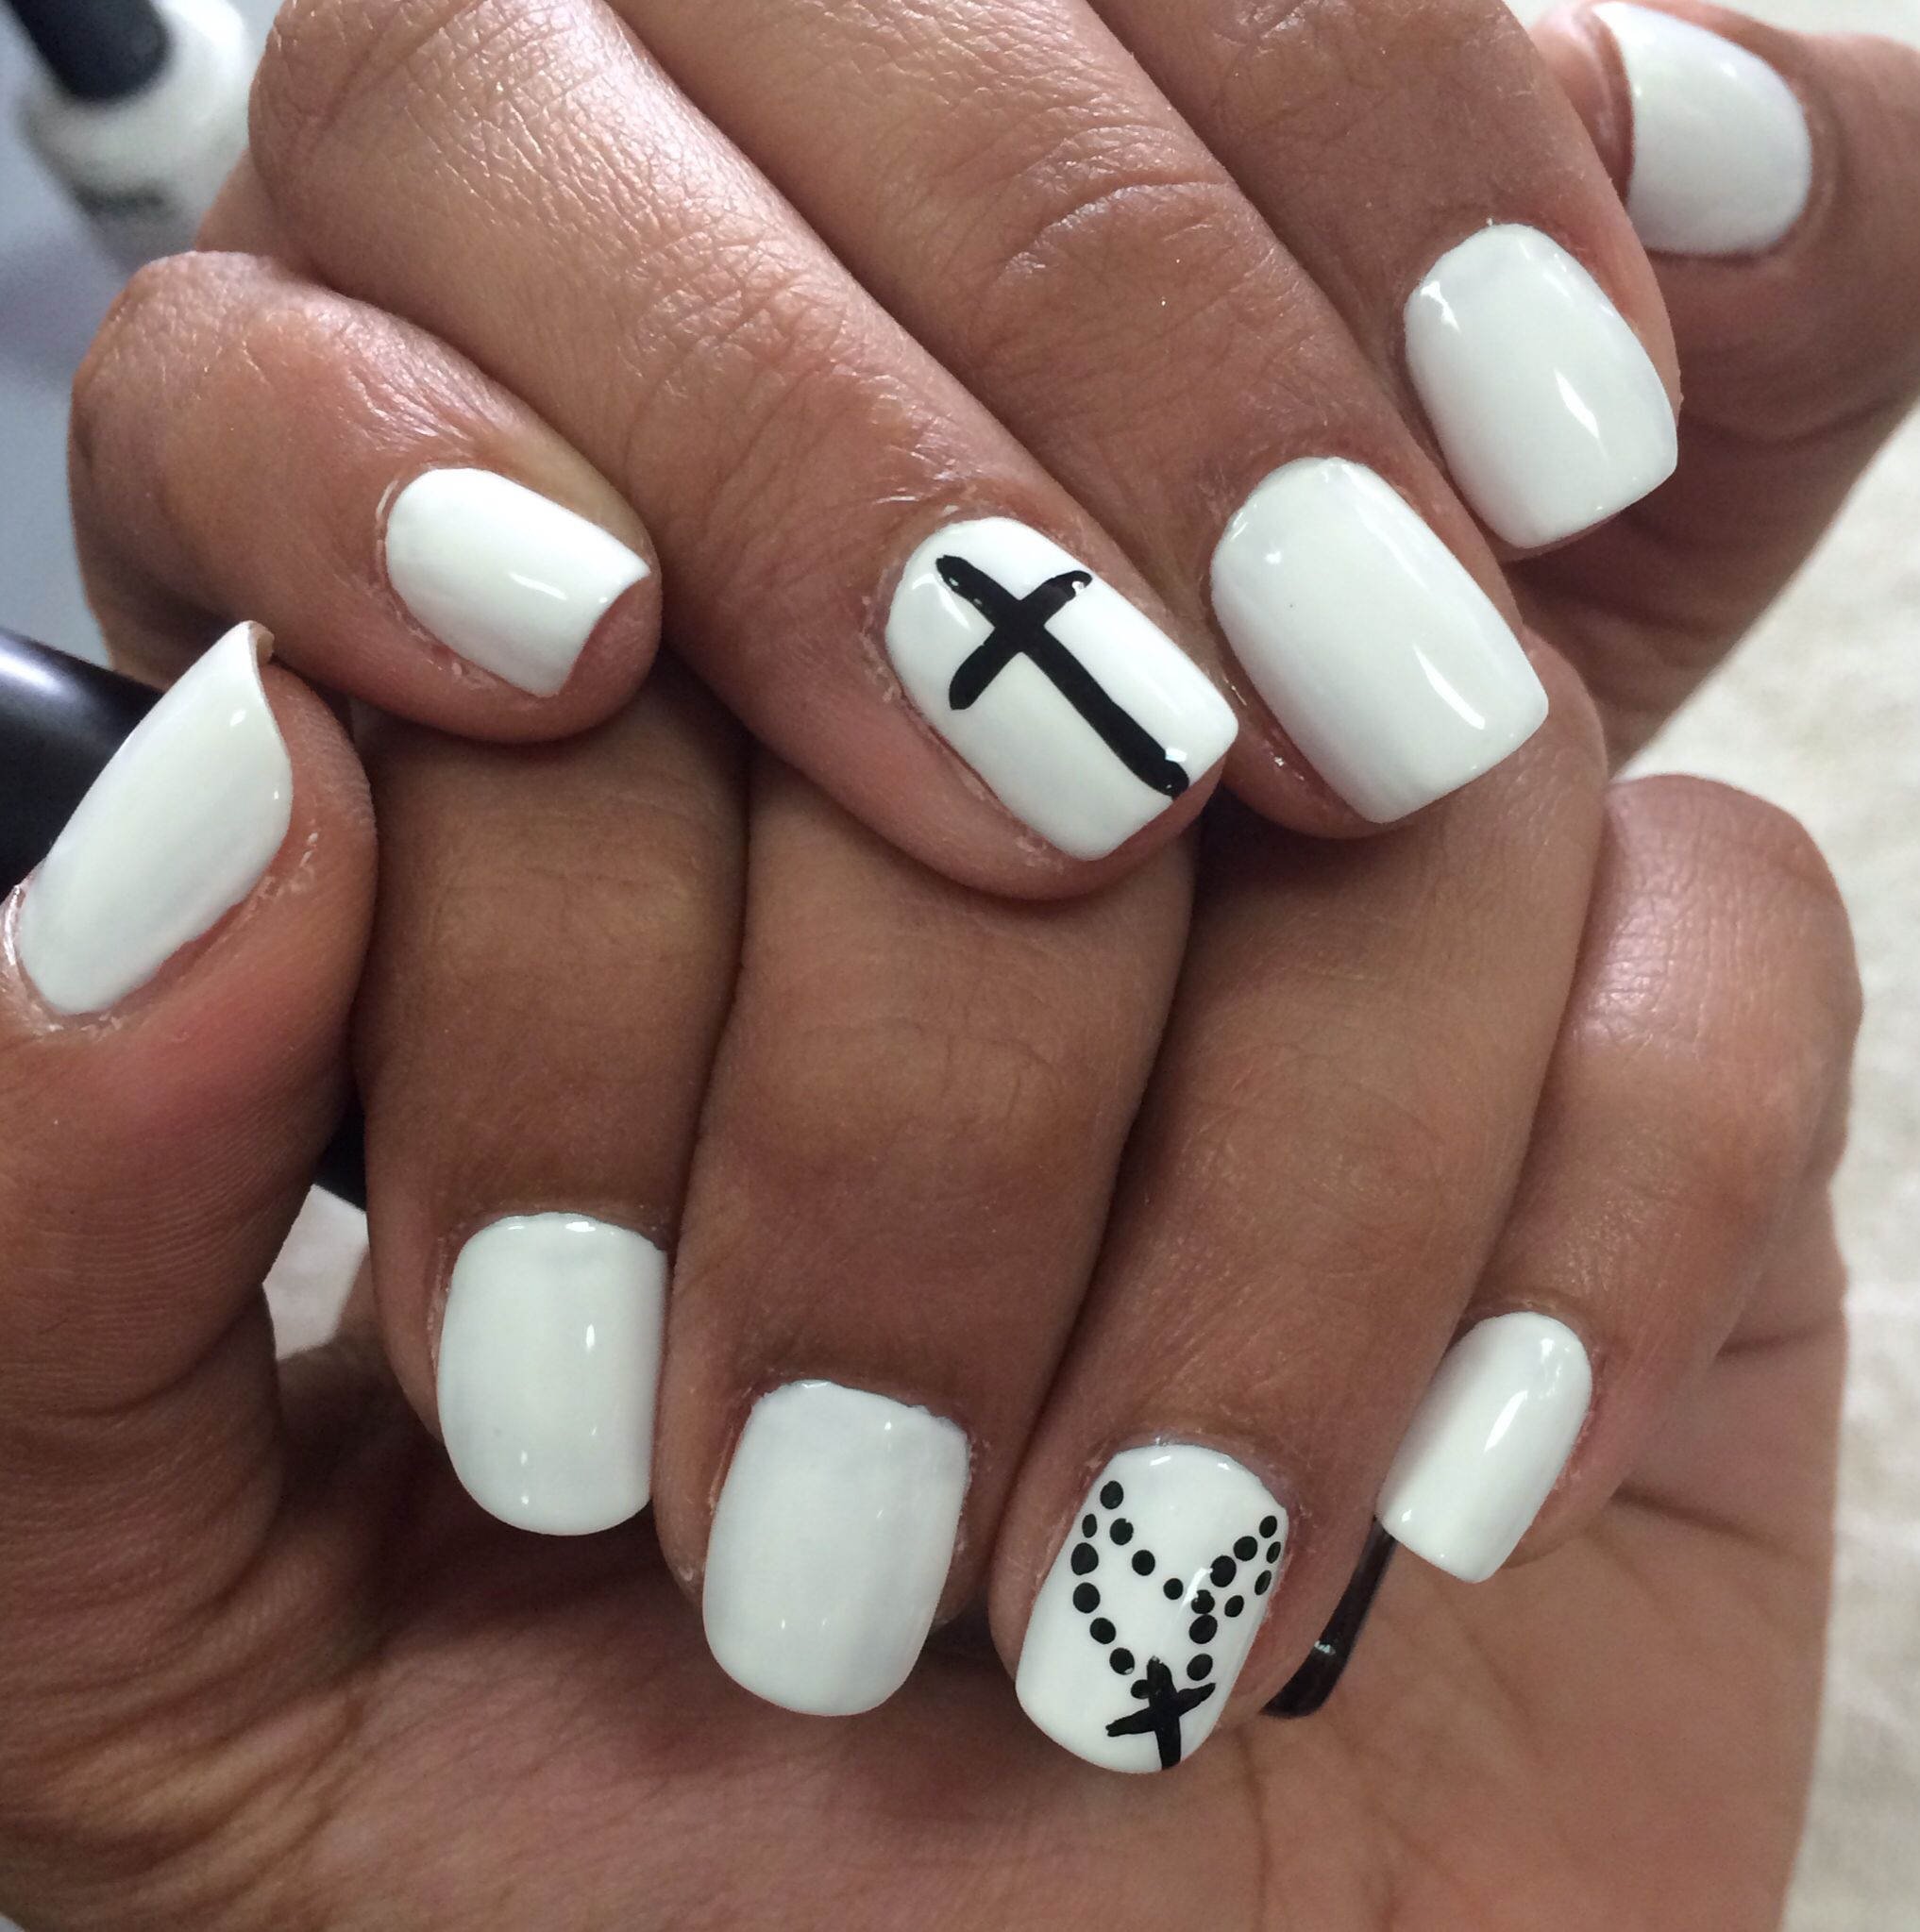 White mani with black cross Nail art | Nails & Feet | Pinterest ...